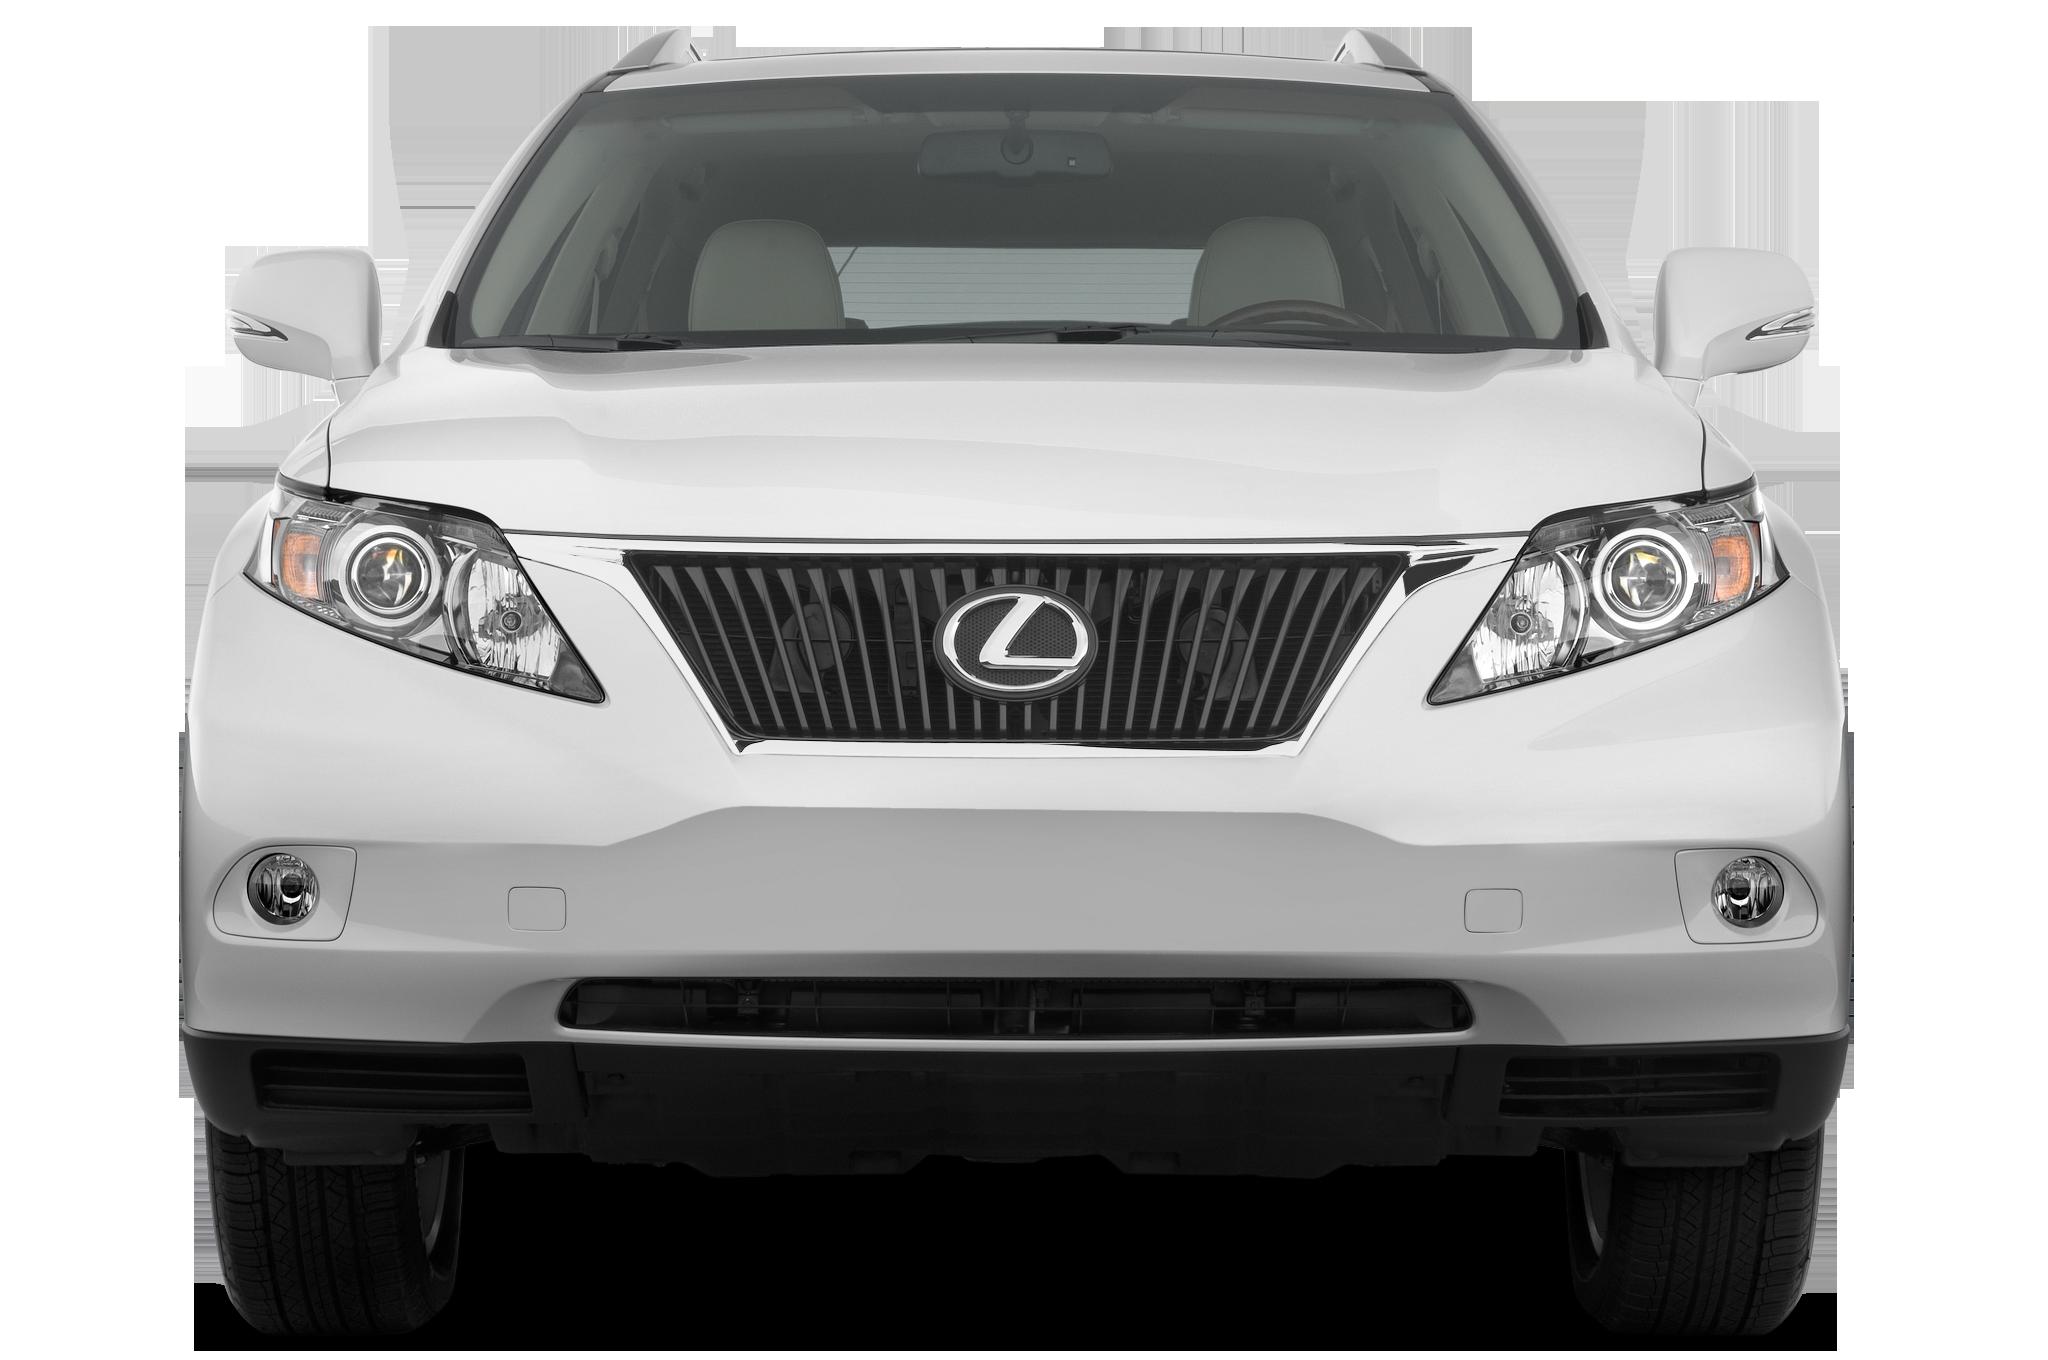 2011 Lexus RX 350 AWD - Editors' Notebook - Automobile ...